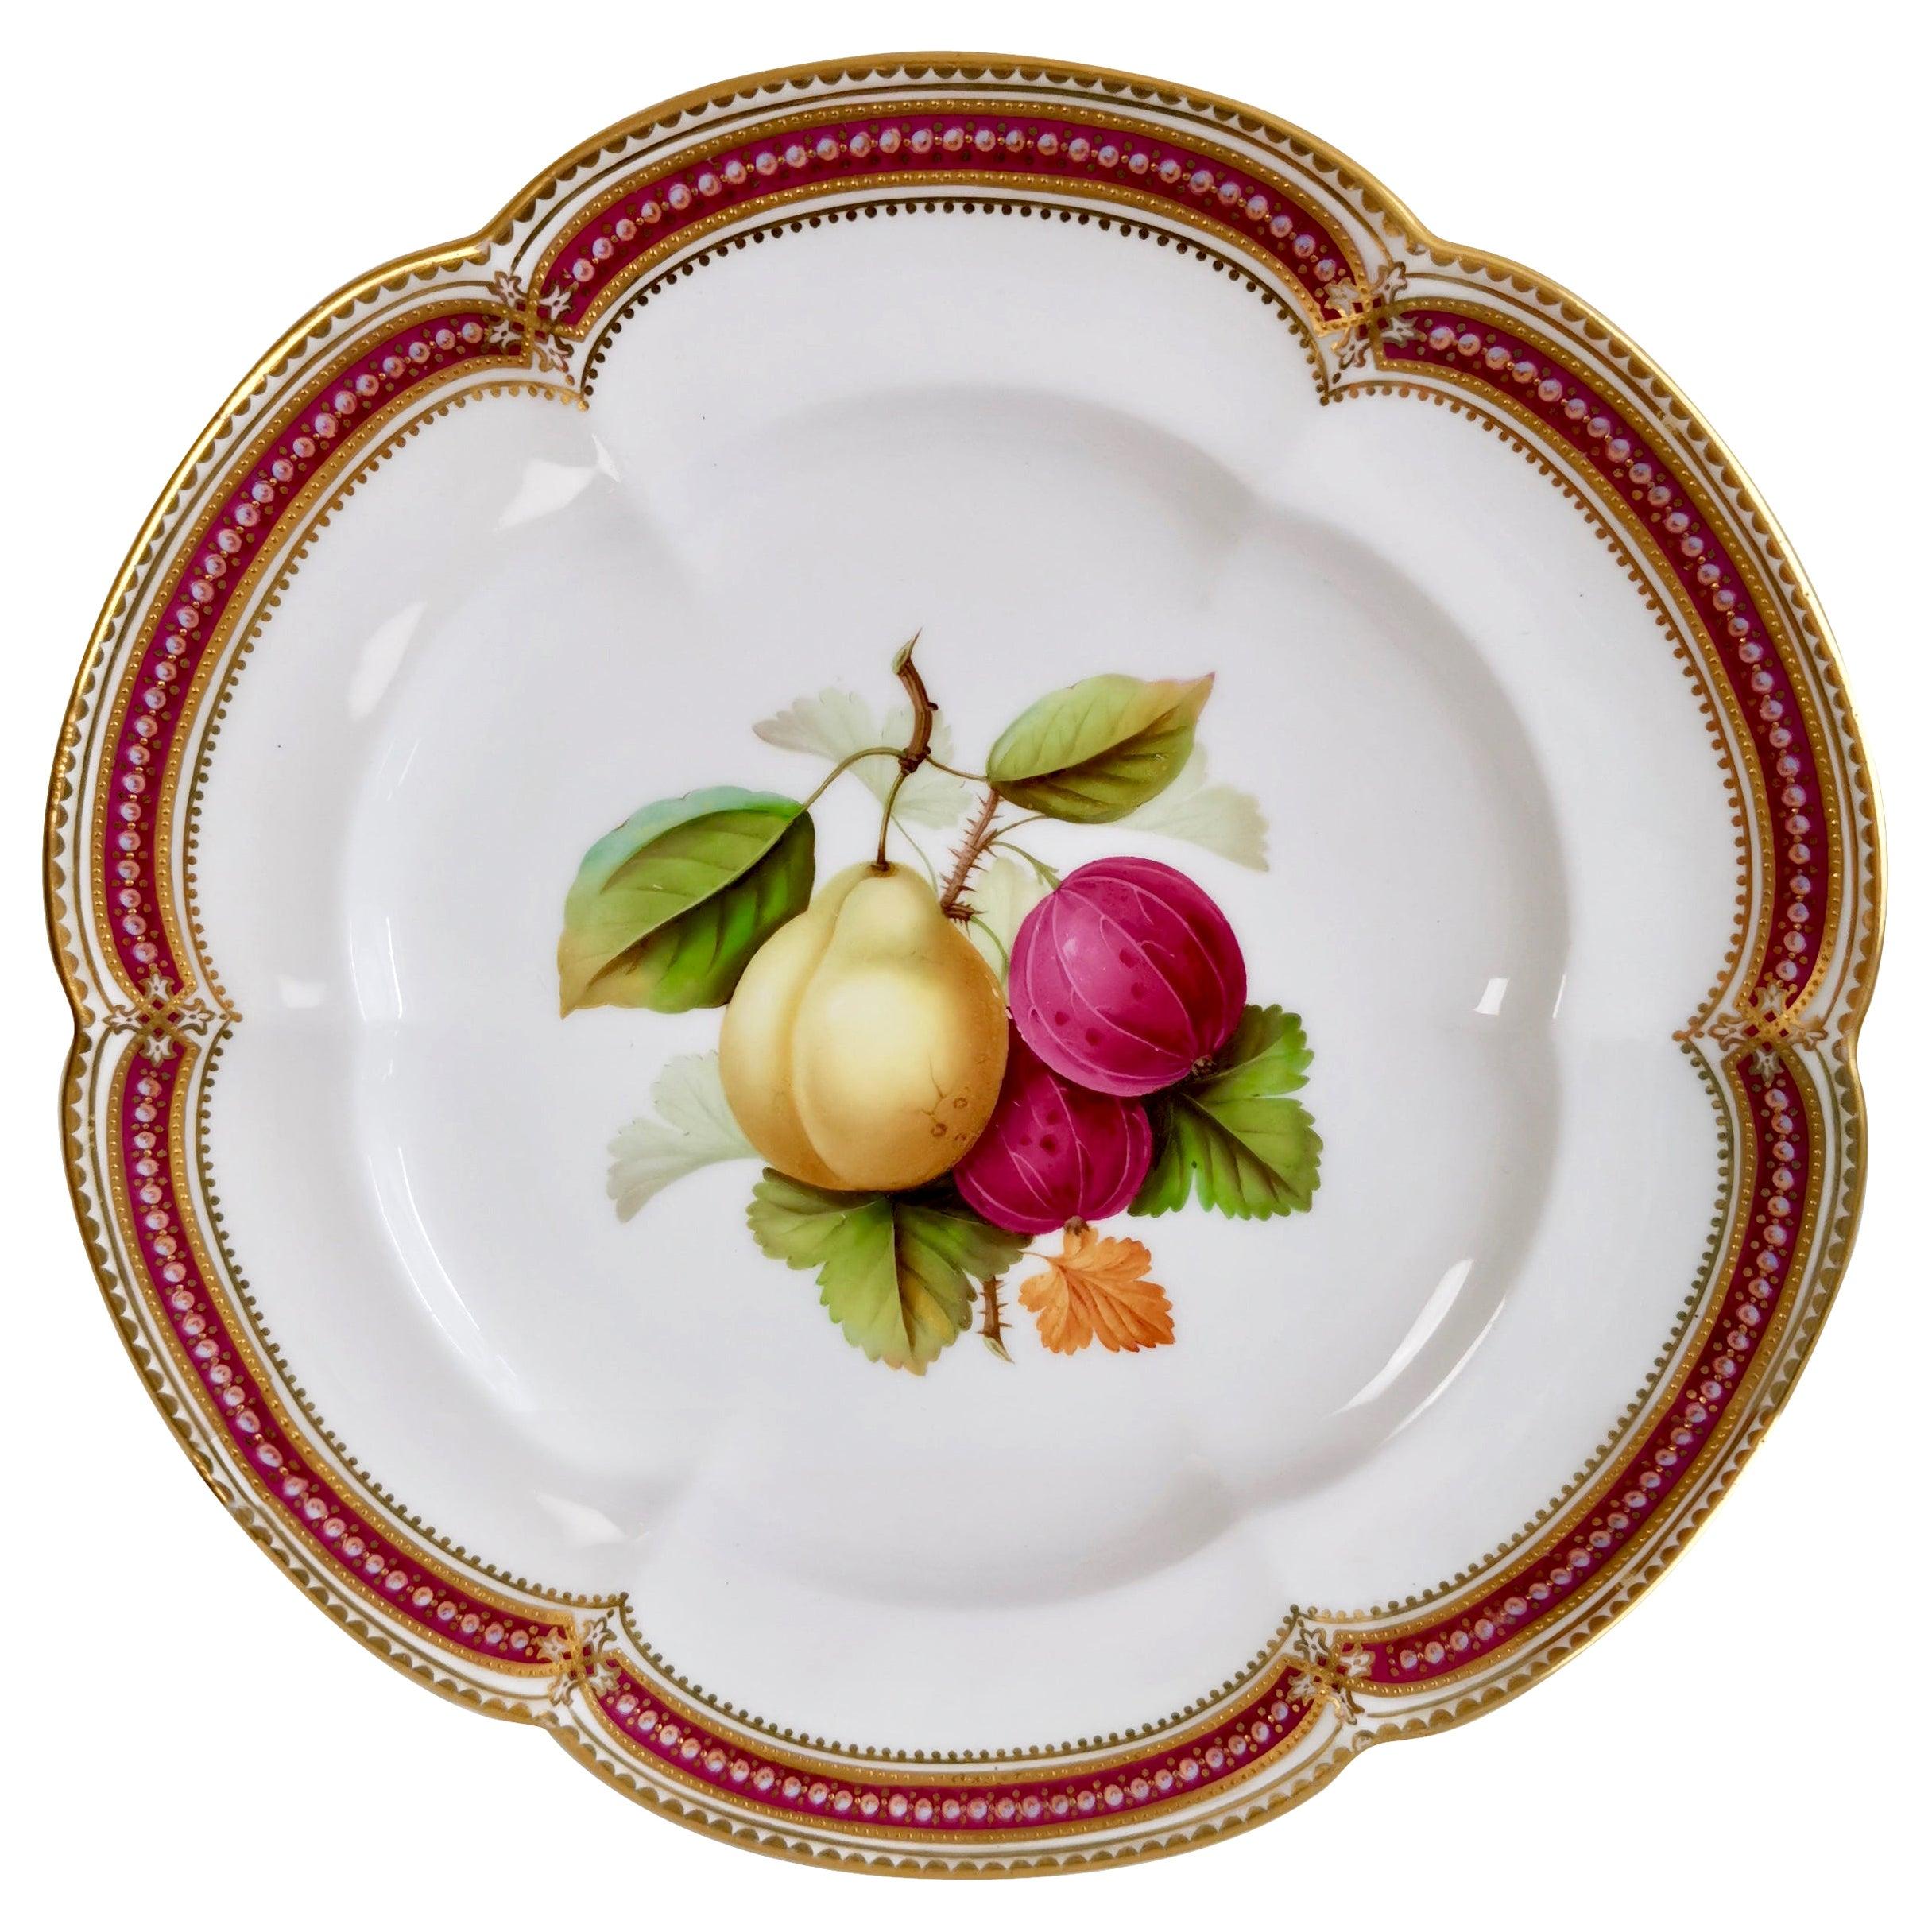 Coalport Dessert Plate, Fruit Painting by Jabey Aston, circa 1870